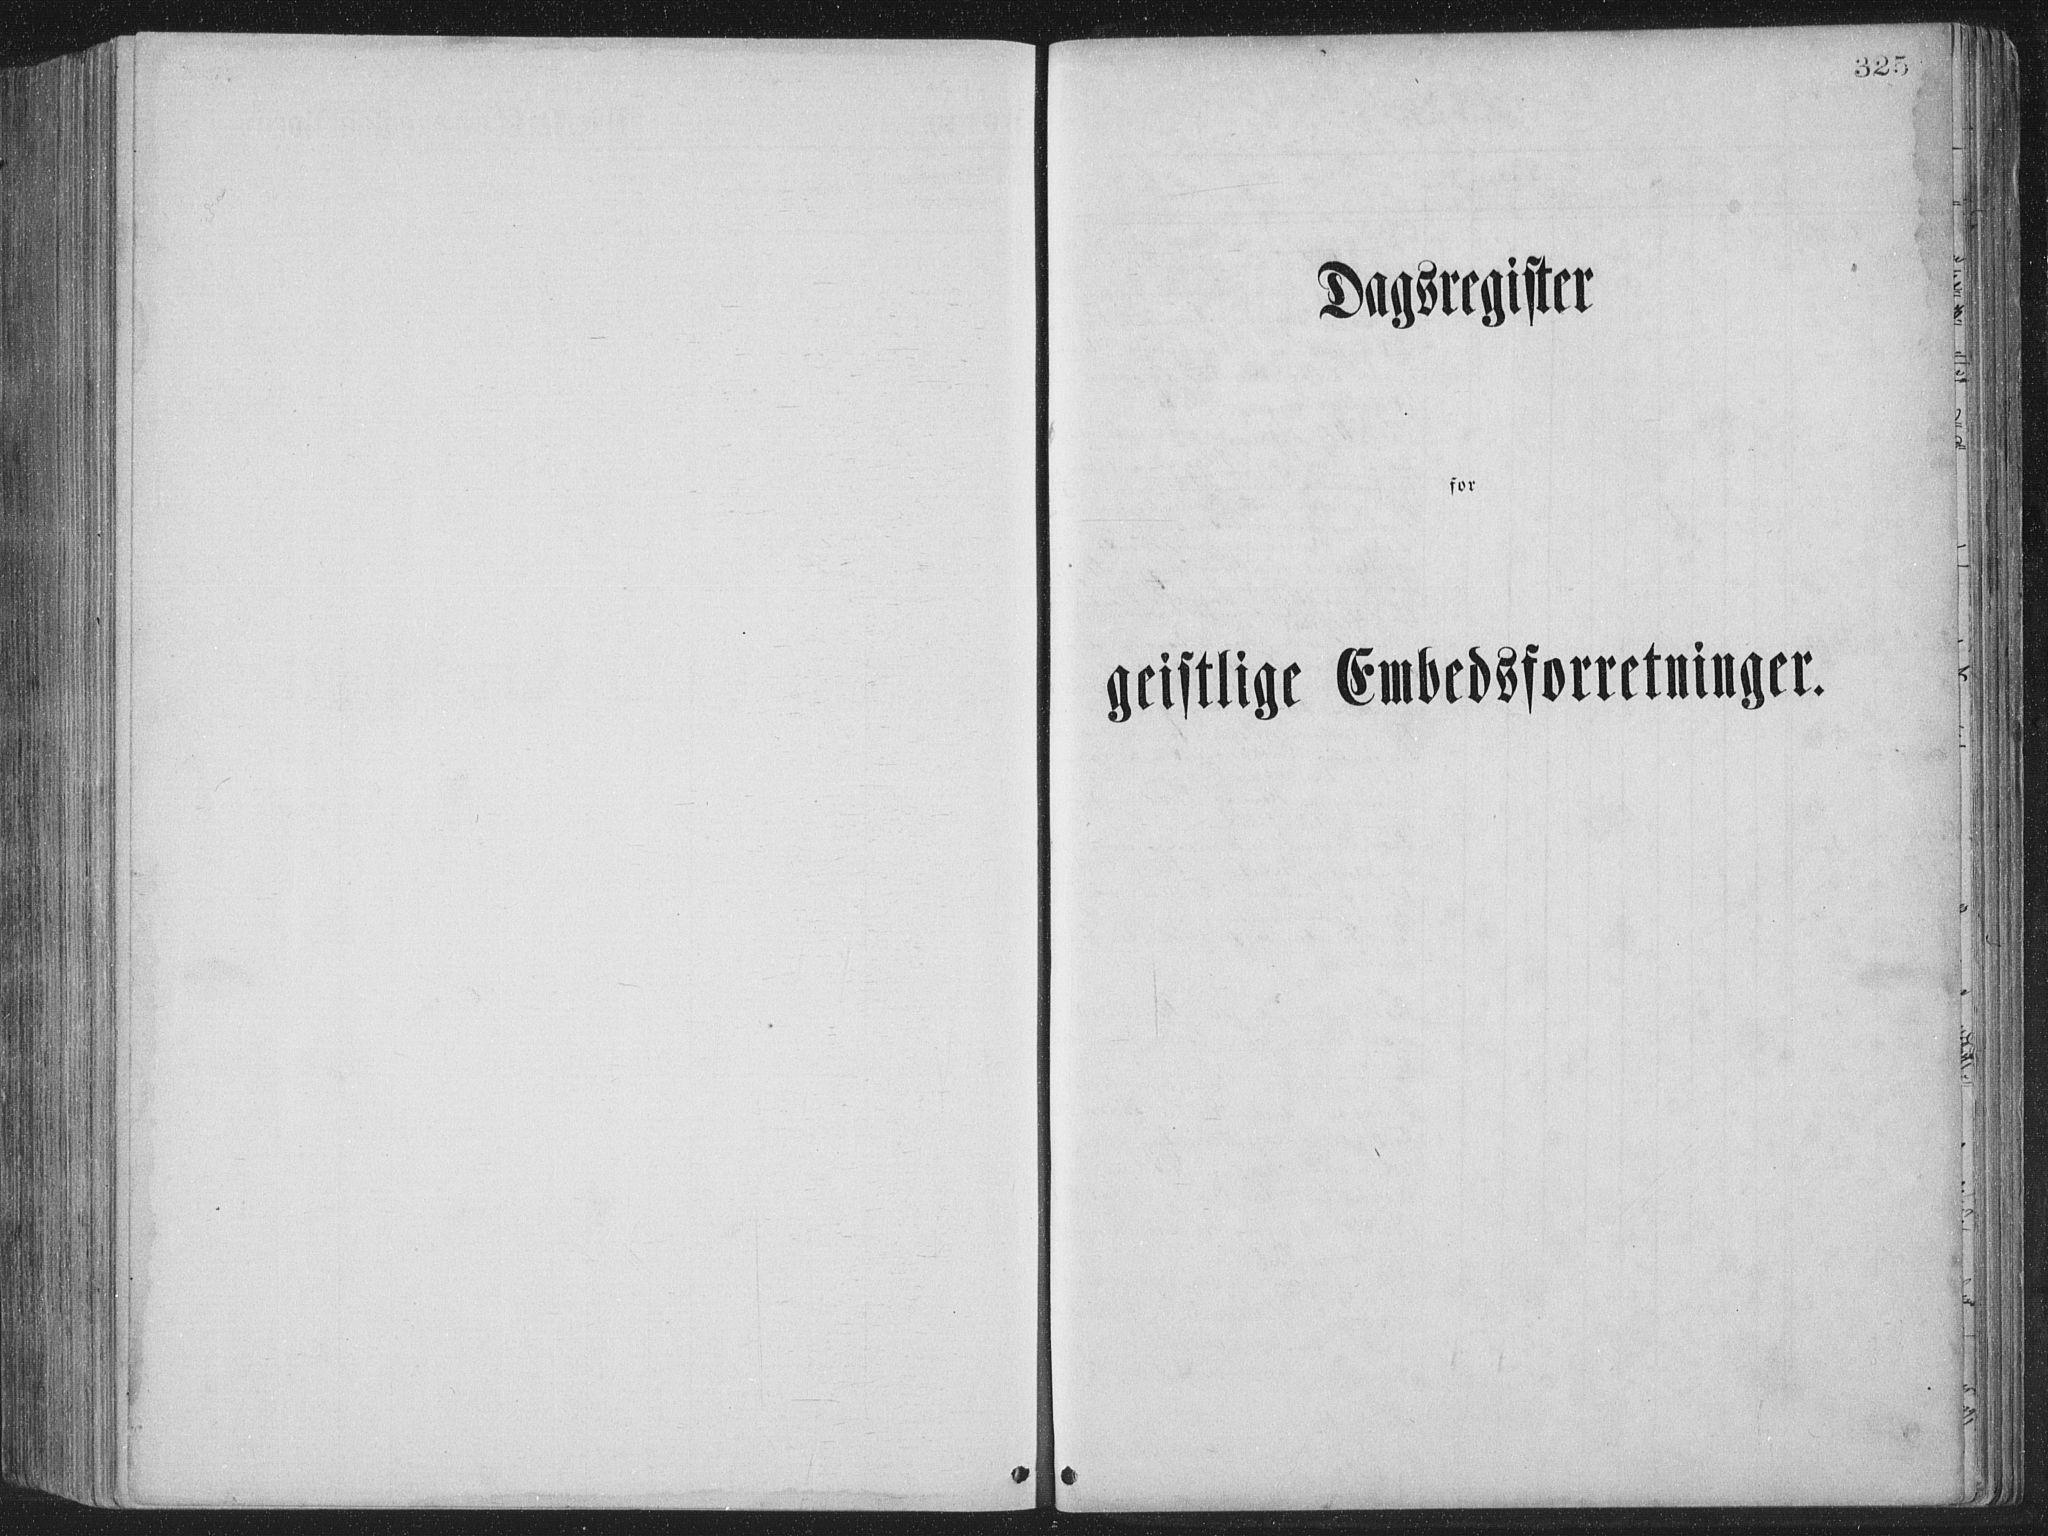 SAT, Ministerialprotokoller, klokkerbøker og fødselsregistre - Nordland, 885/L1213: Klokkerbok nr. 885C02, 1874-1892, s. 325